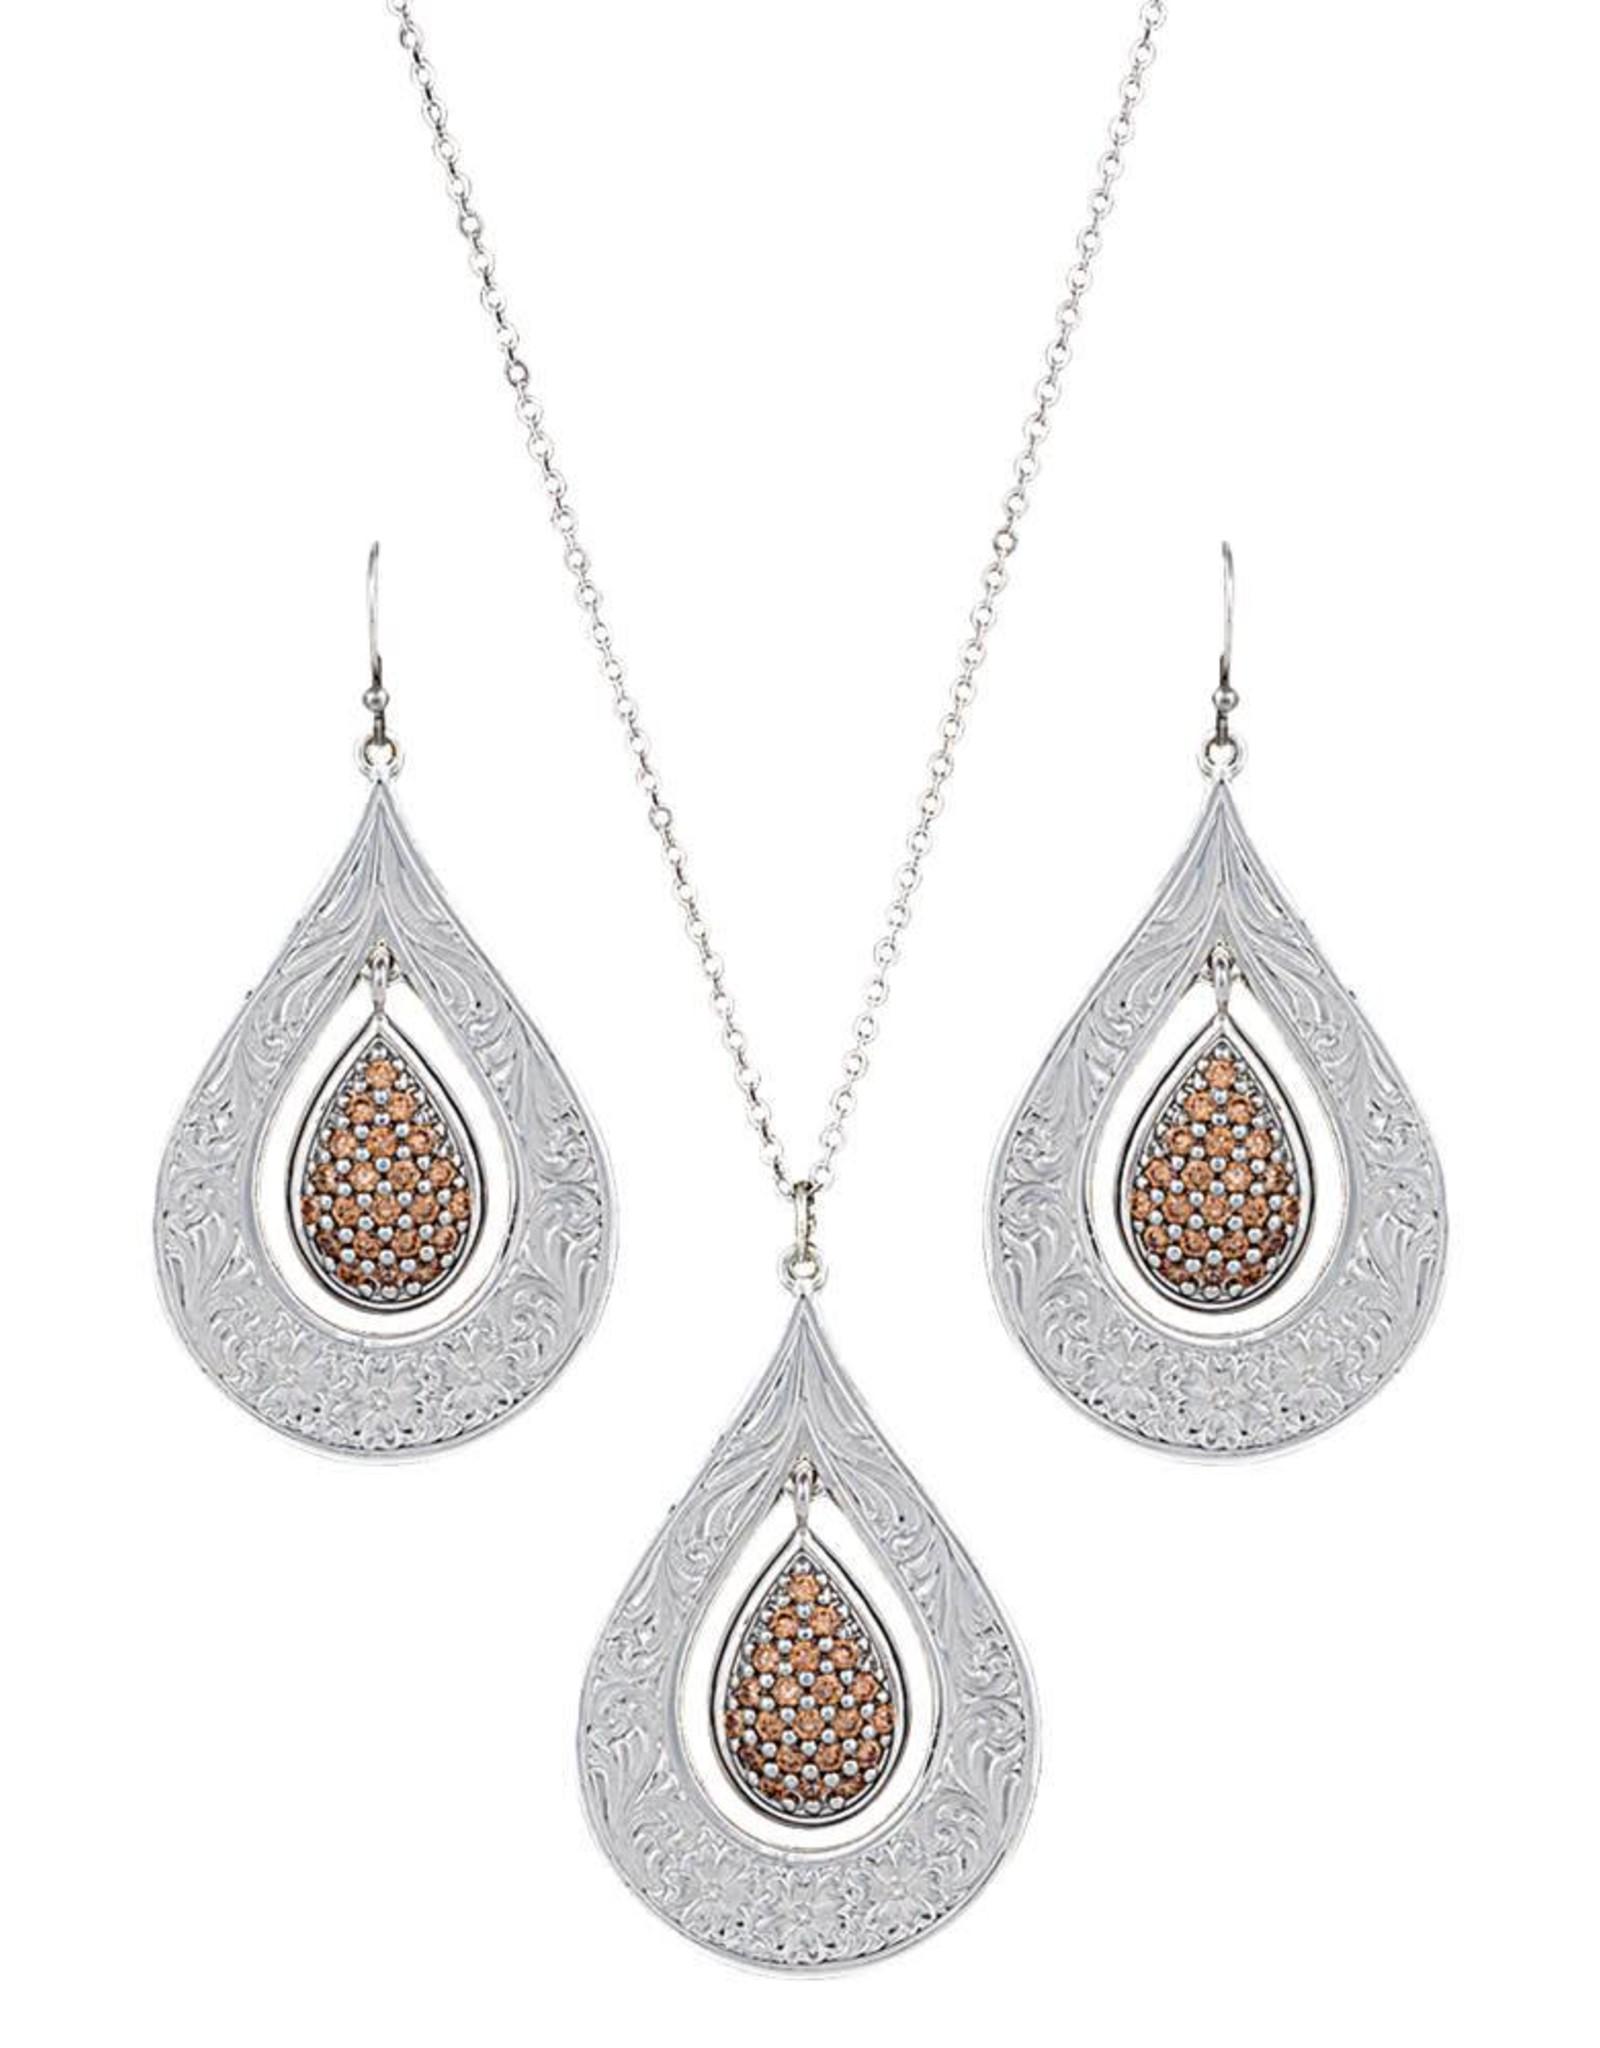 Montana Silversmiths Flowers Champagne Spark Jewelry Set